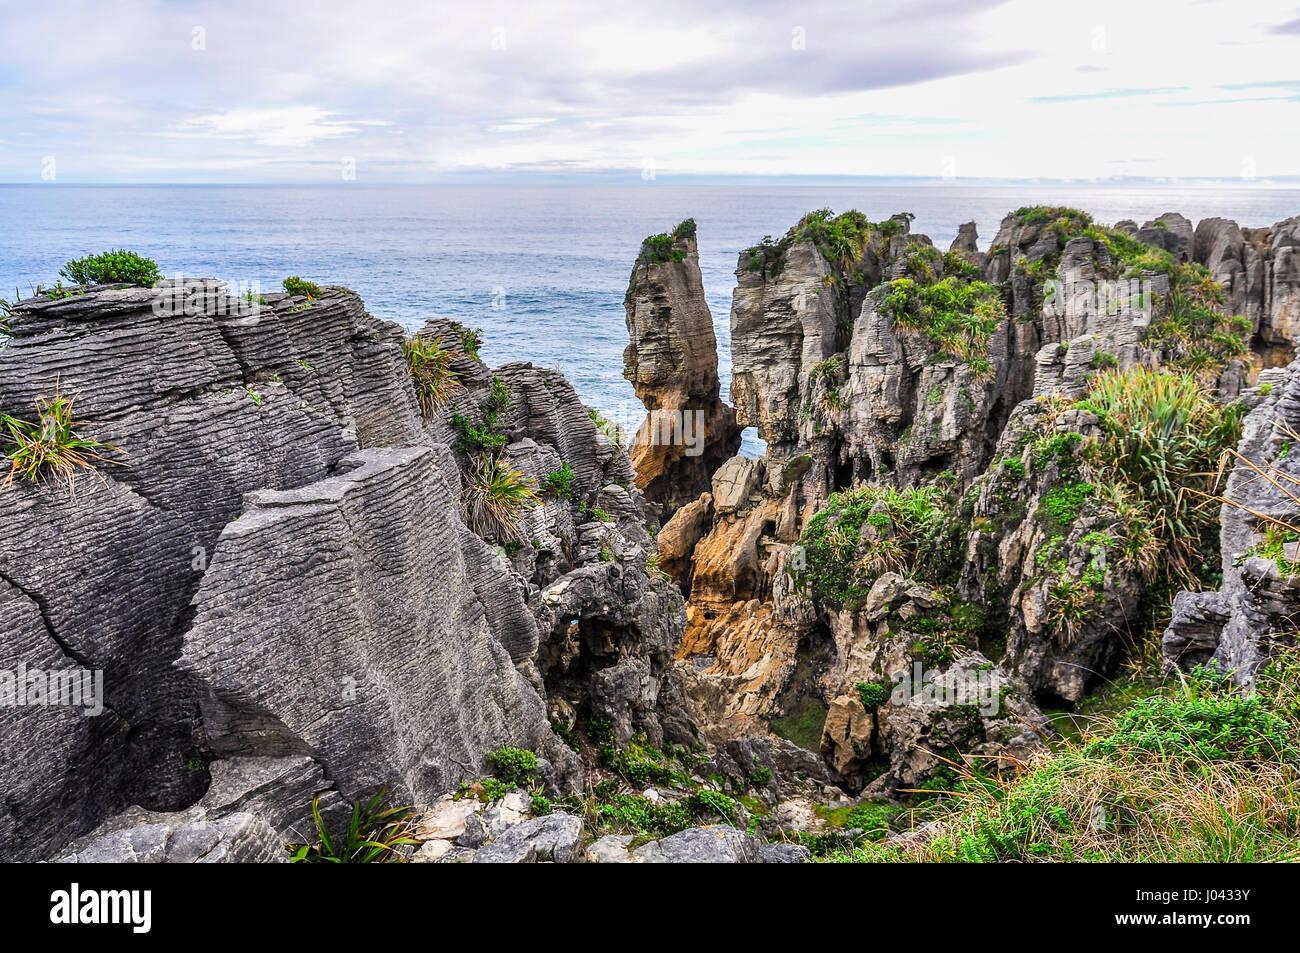 Pancake rocks in Punakaiki sulla costa ovest della Nuova Zelanda Immagini Stock